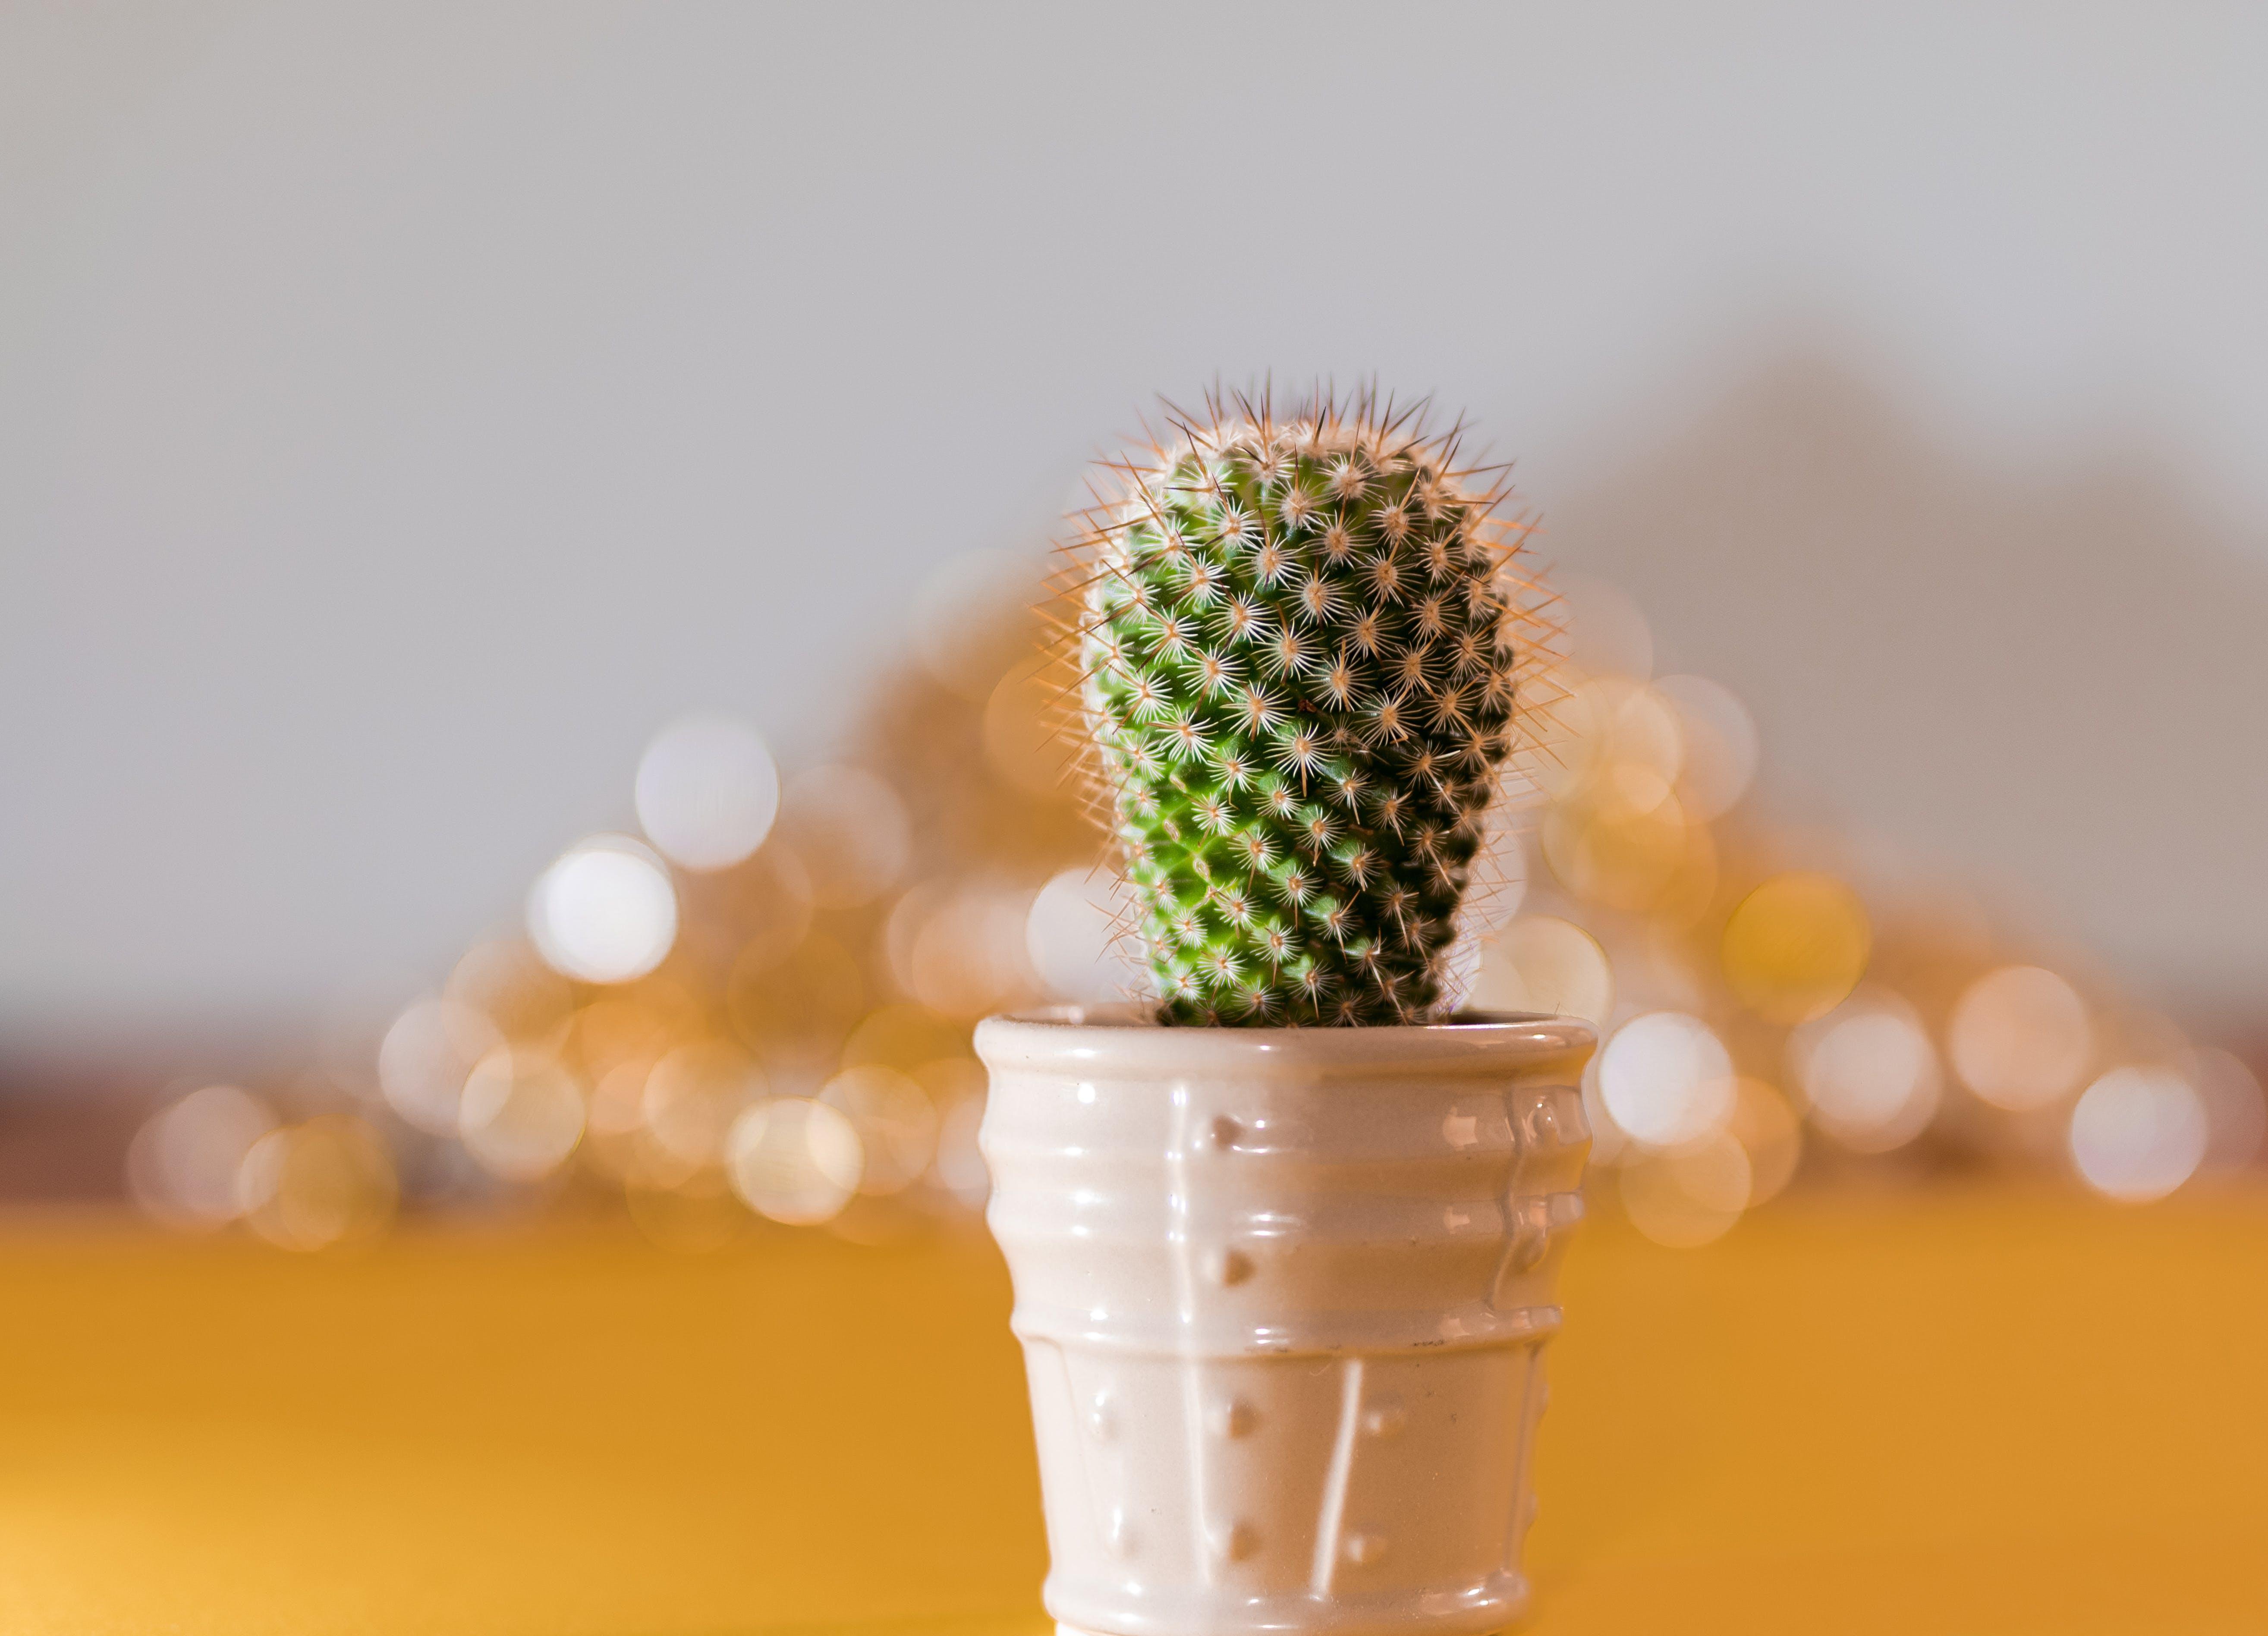 Free stock photo of cactus, cactus plant, cloudy skies, desert